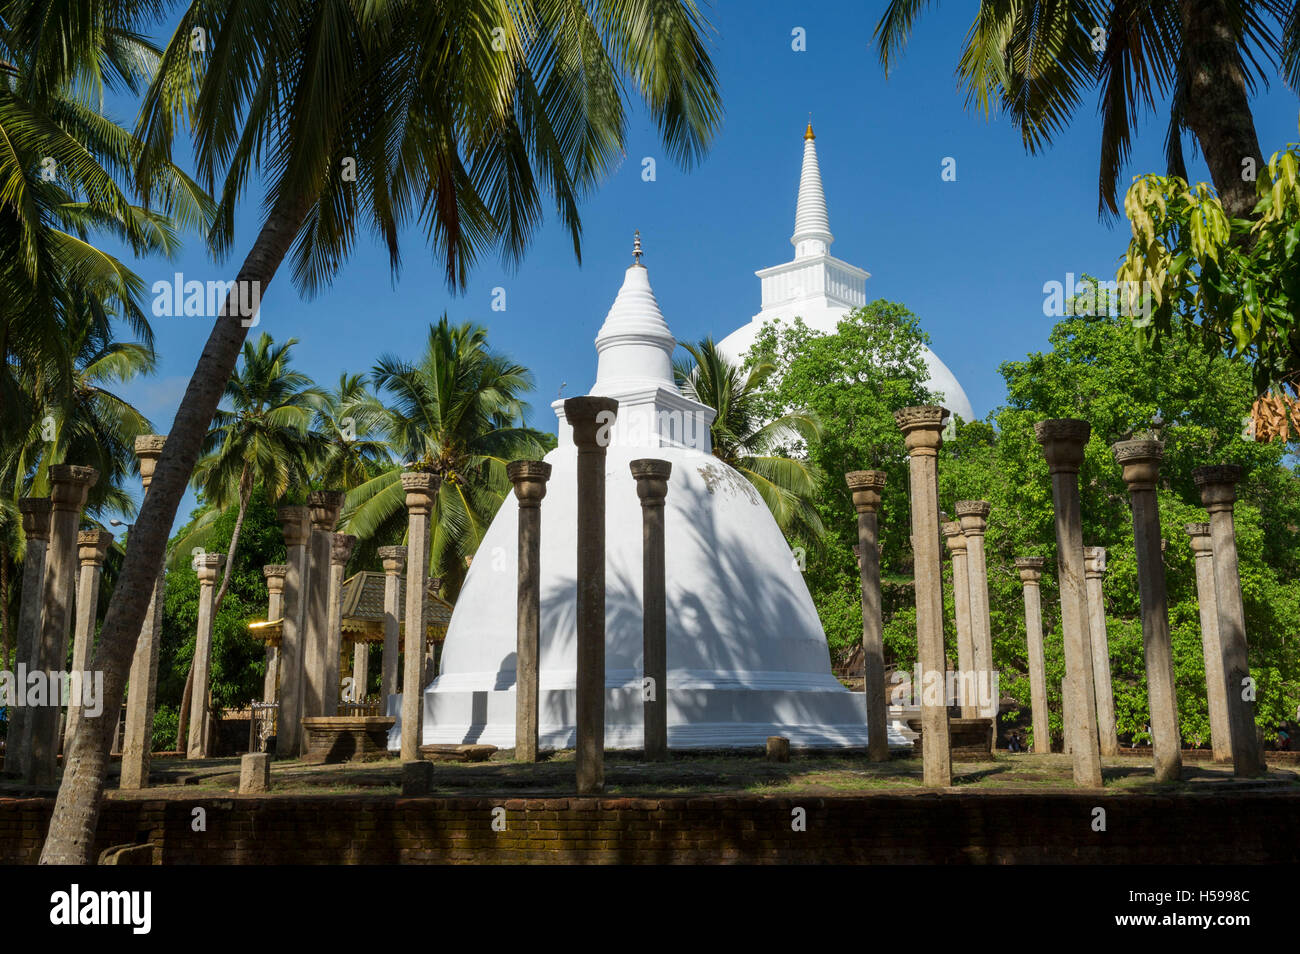 Ambasthale Dagoba, Mihintale temple, Anuradhapura, Sri Lanka Stock Photo